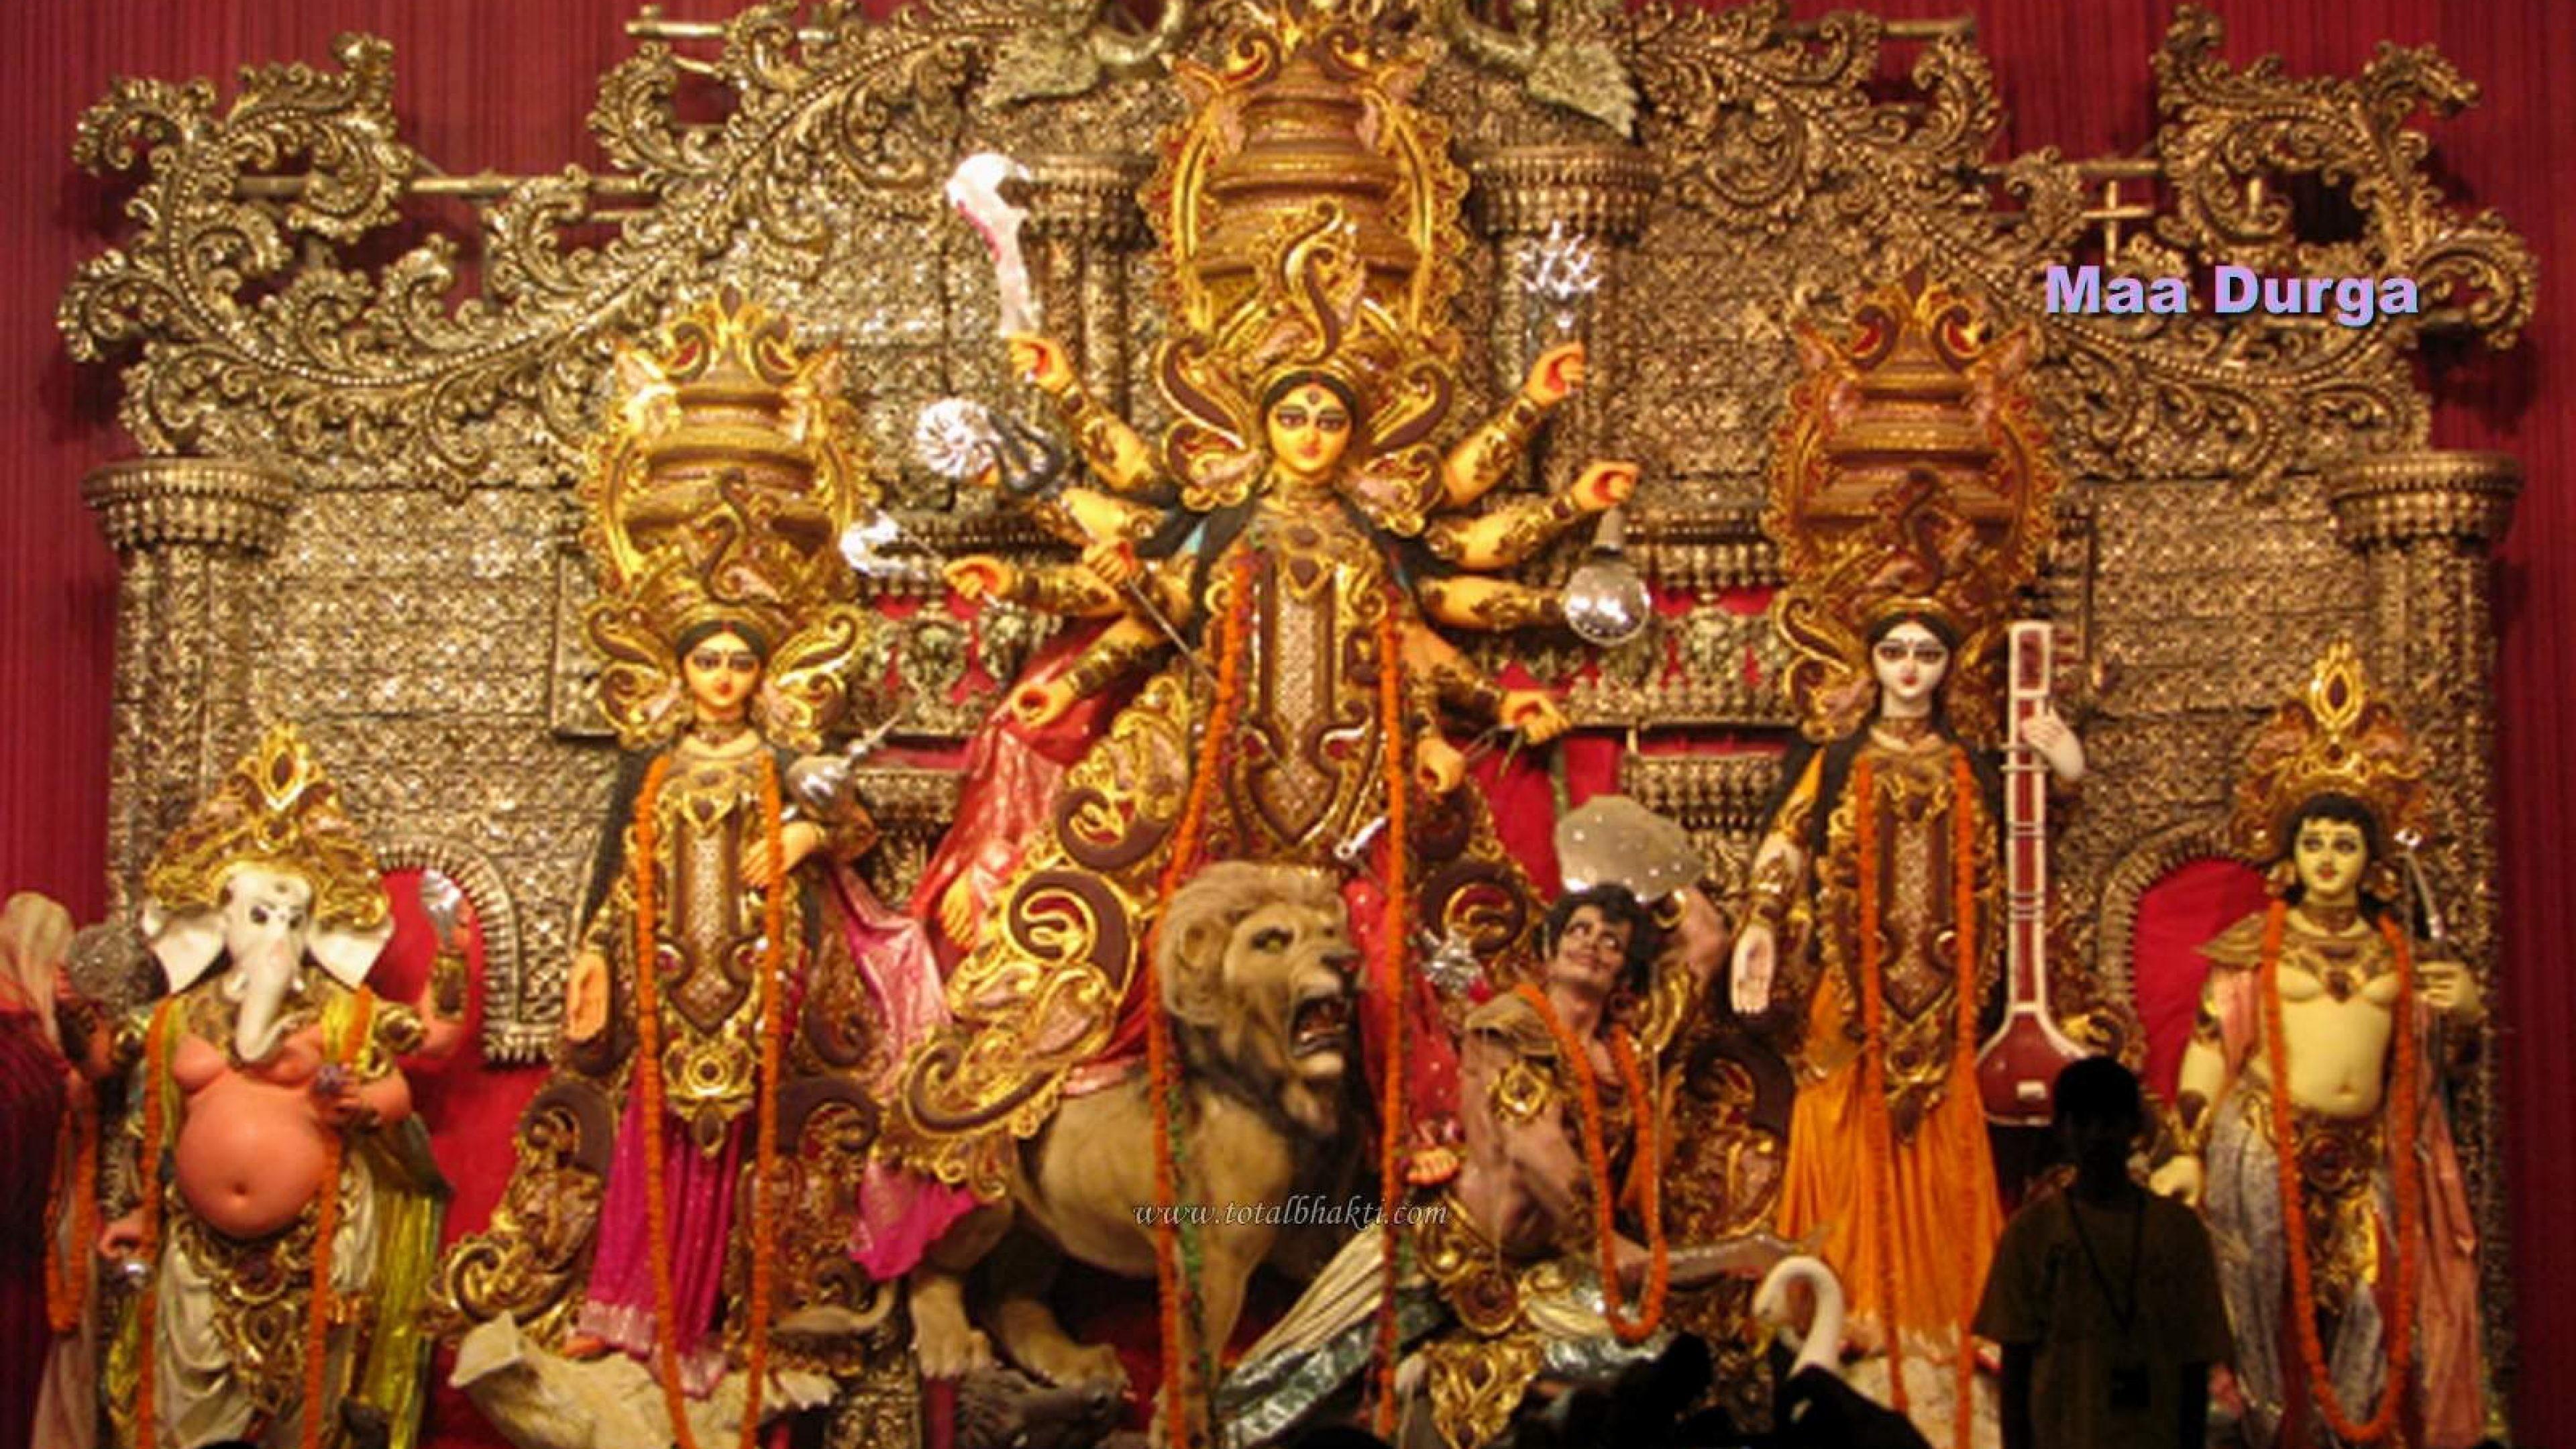 Durga Photo Hd Wallpaper Download